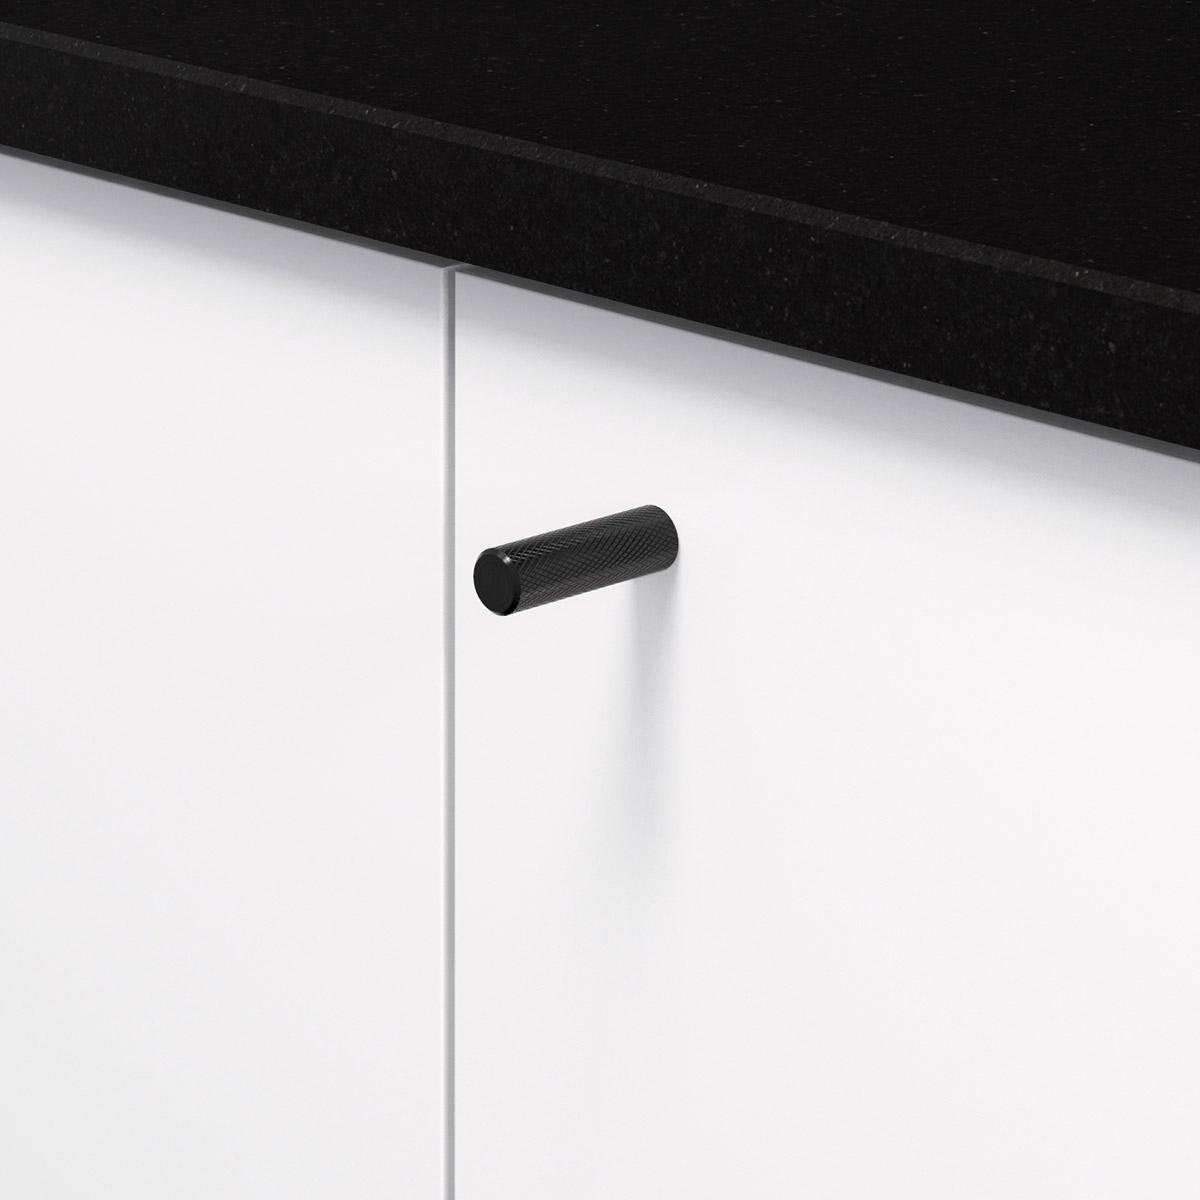 Knopp matt svart 370226 11 10 mm ncs s 0300 n granit svart